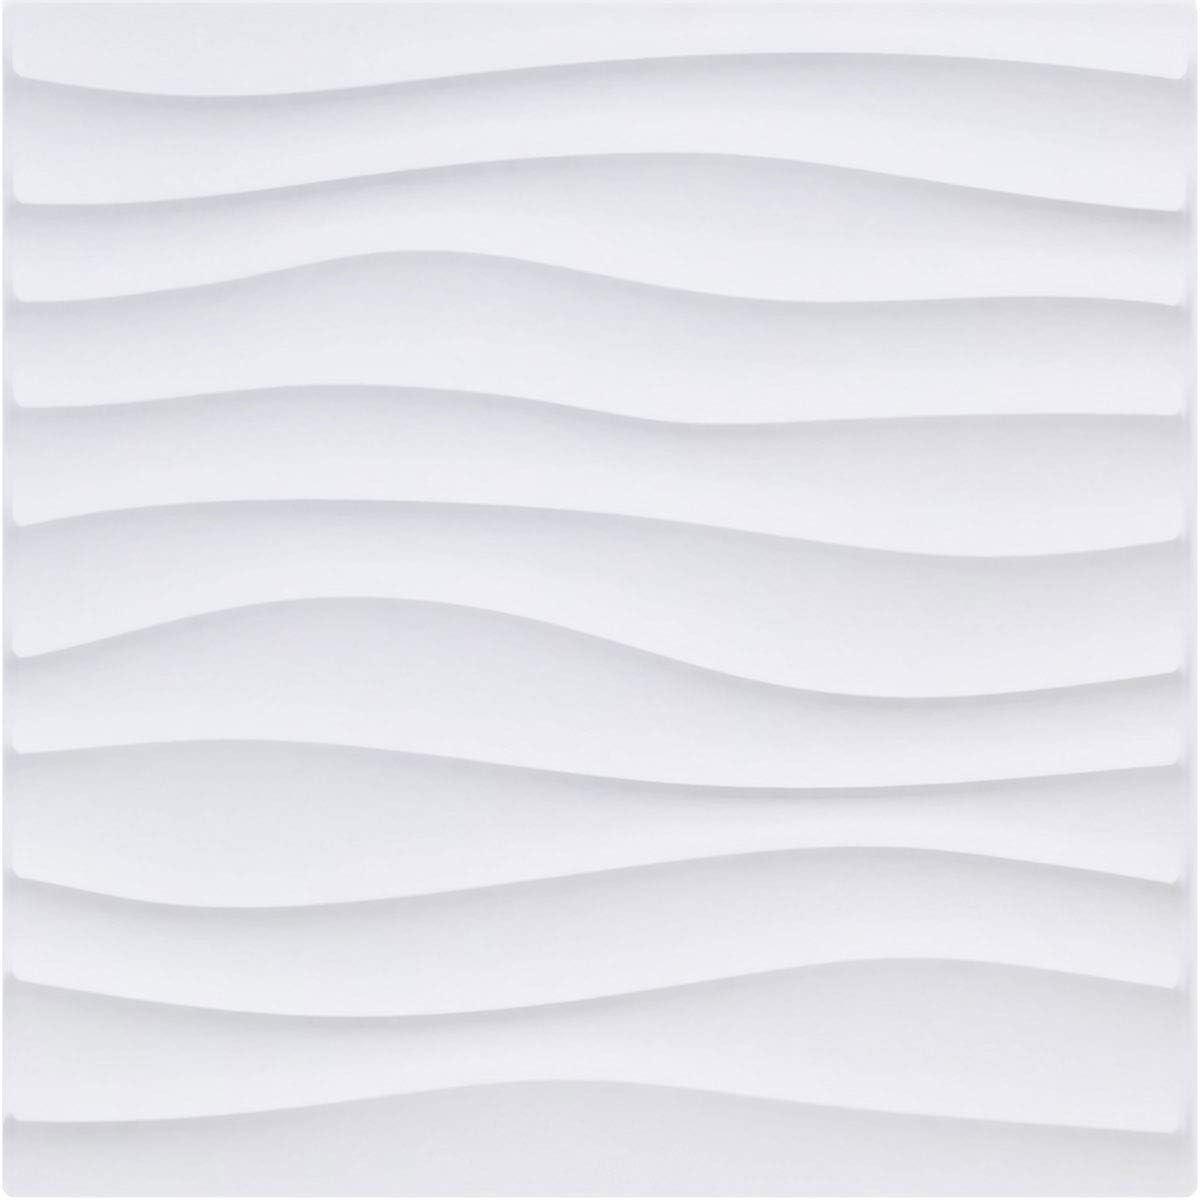 Ekena Millwork WP20X20SOWH-CASE-10 Online limited product Decorati EnduraWall Minneapolis Mall Shoreline